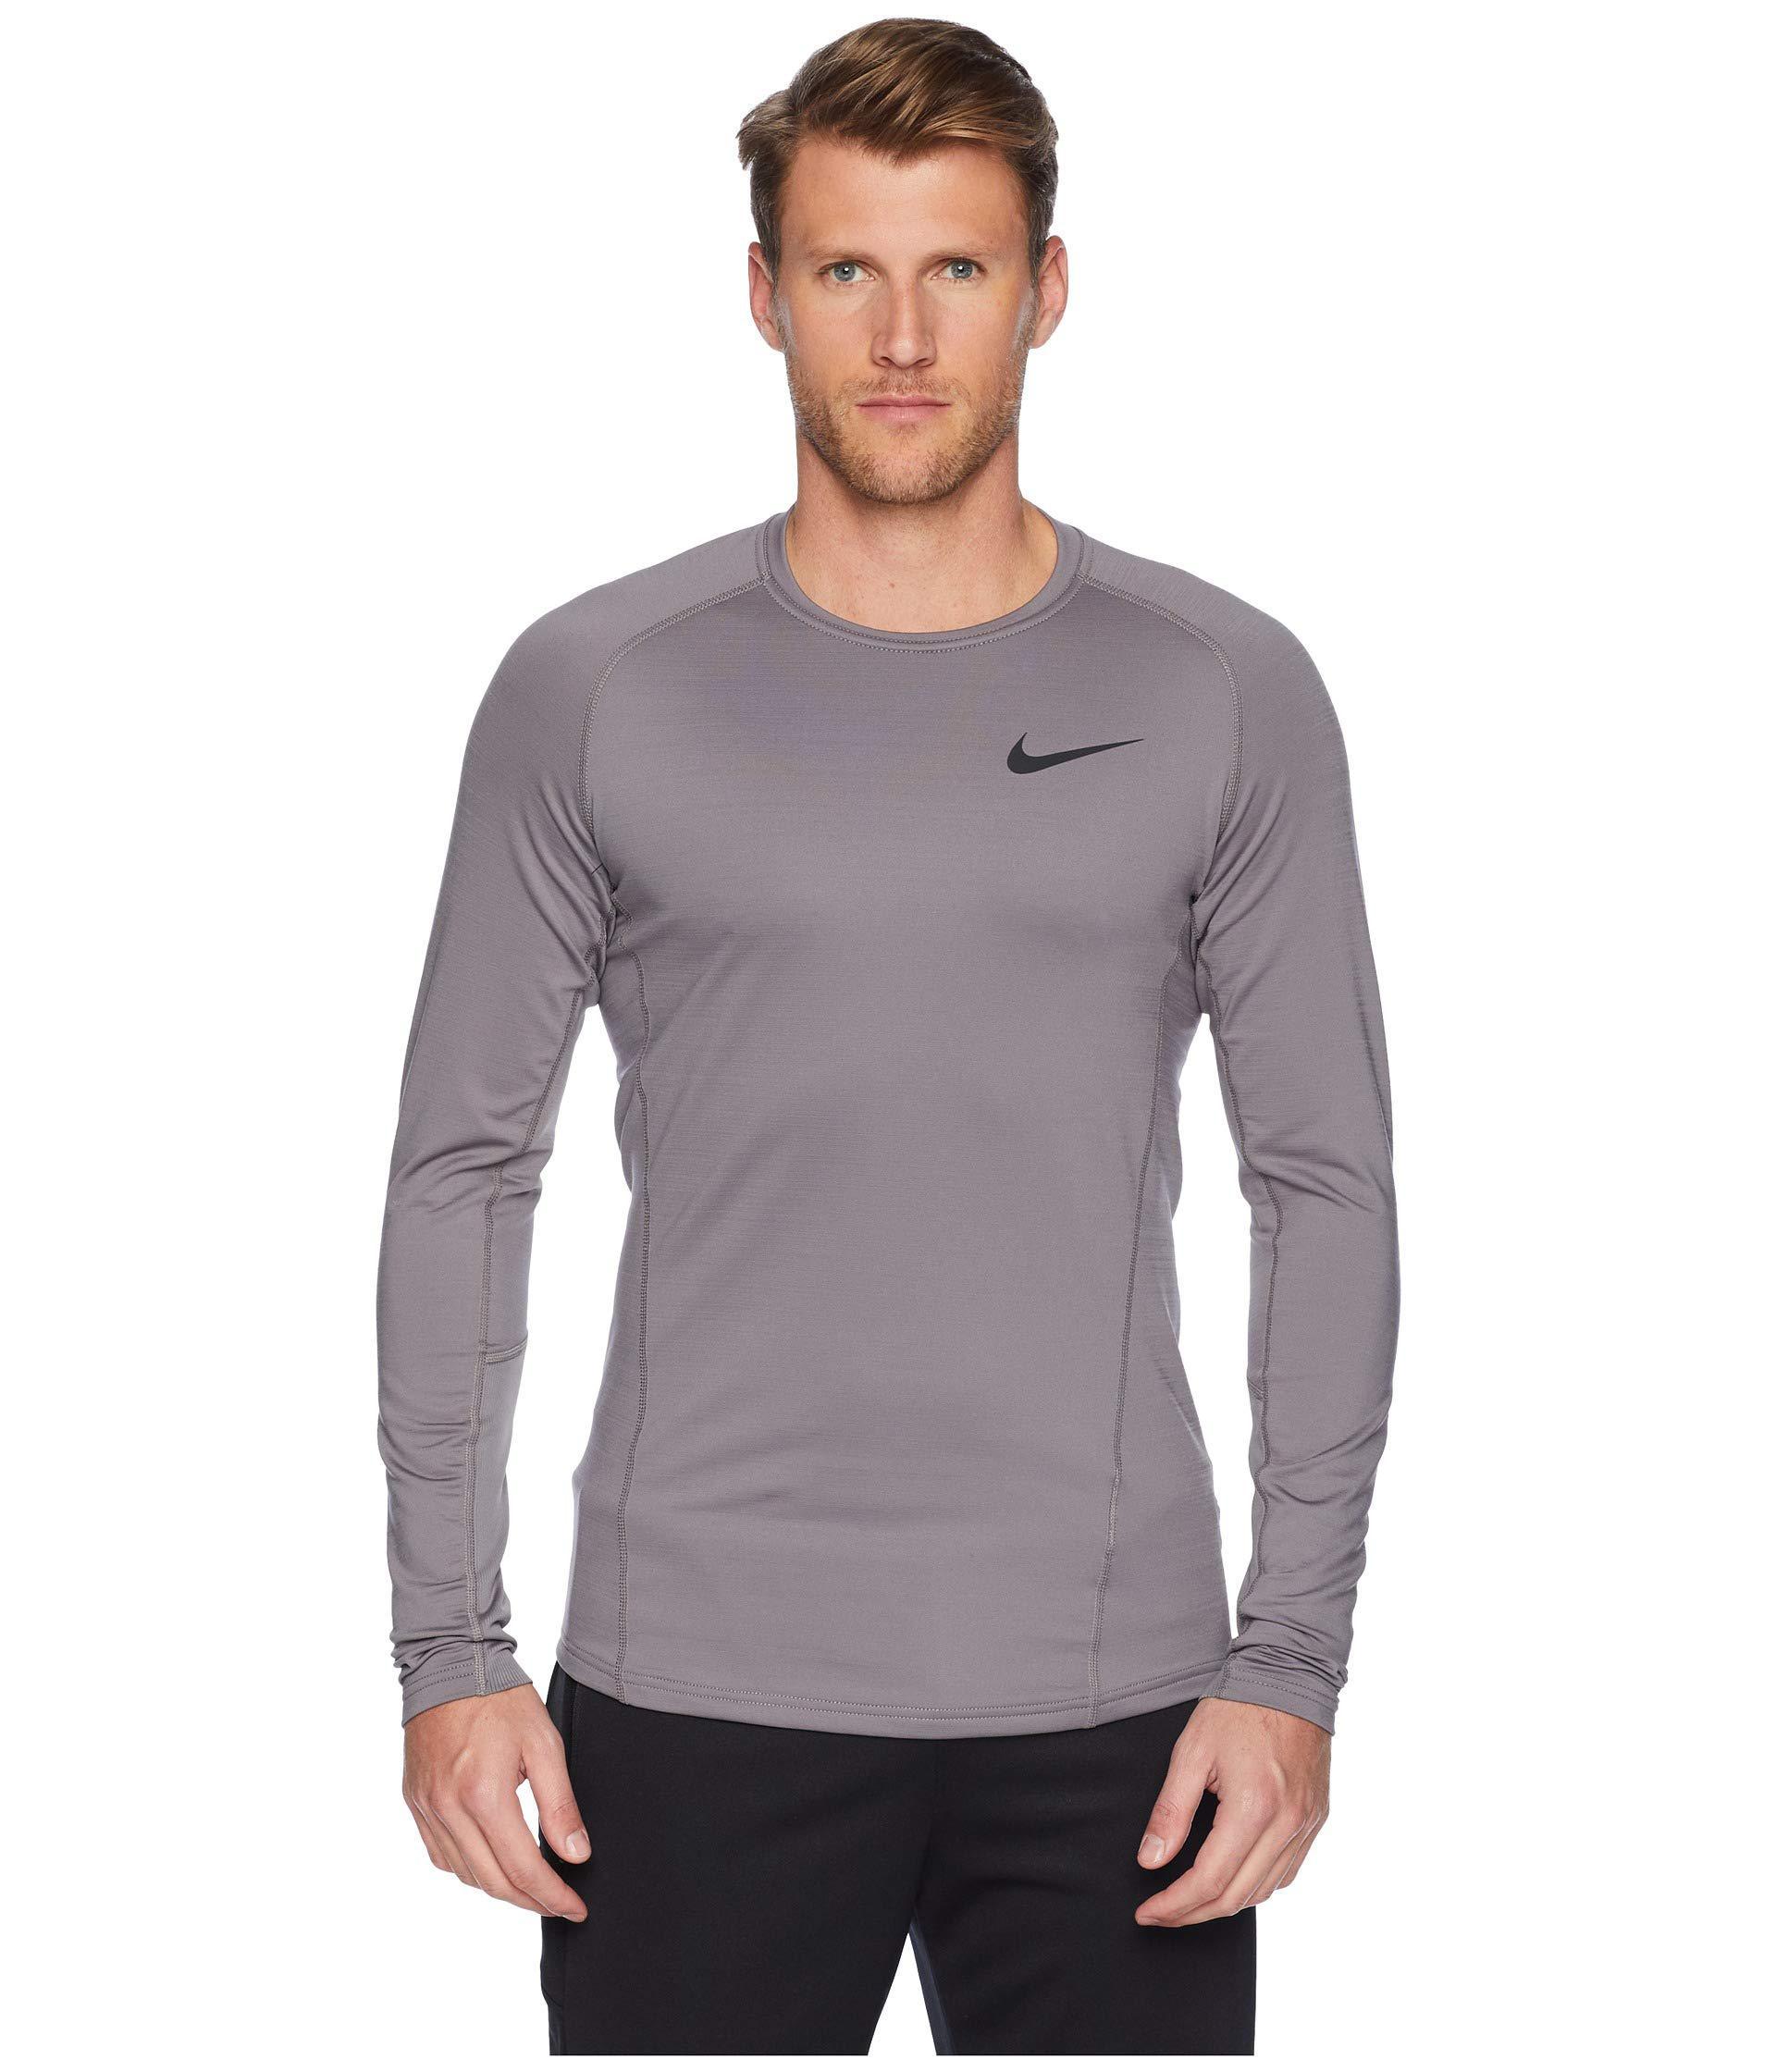 e58543289ea4 Lyst nike pro thermal top long sleeve white black men jpg 1920x2240 Nike  dress clothes for